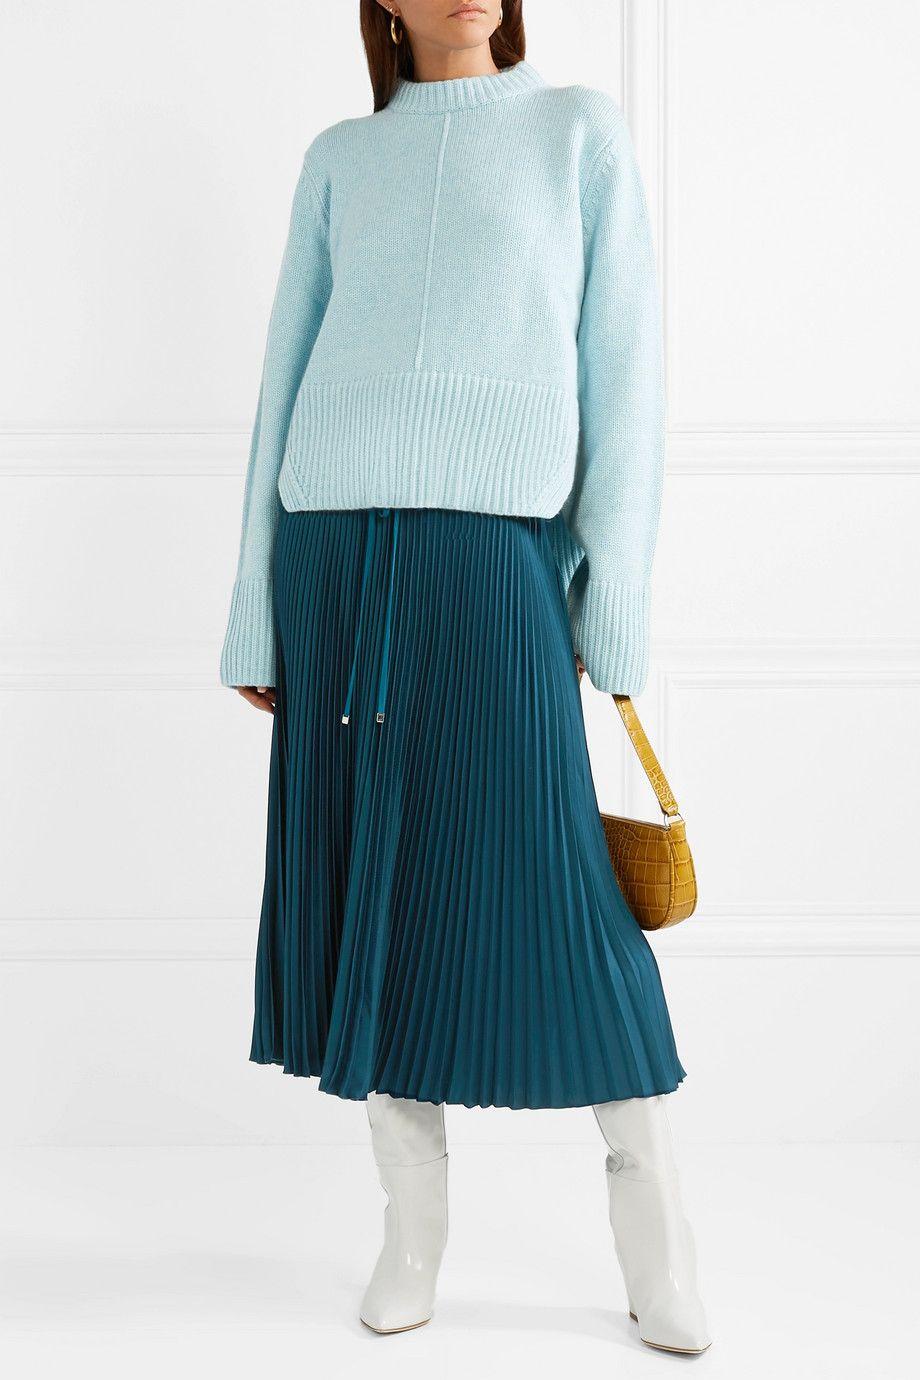 13a7a1fa90 Tibi - Mendini pleated twill midi skirt | Favorites Right Now | Midi ...